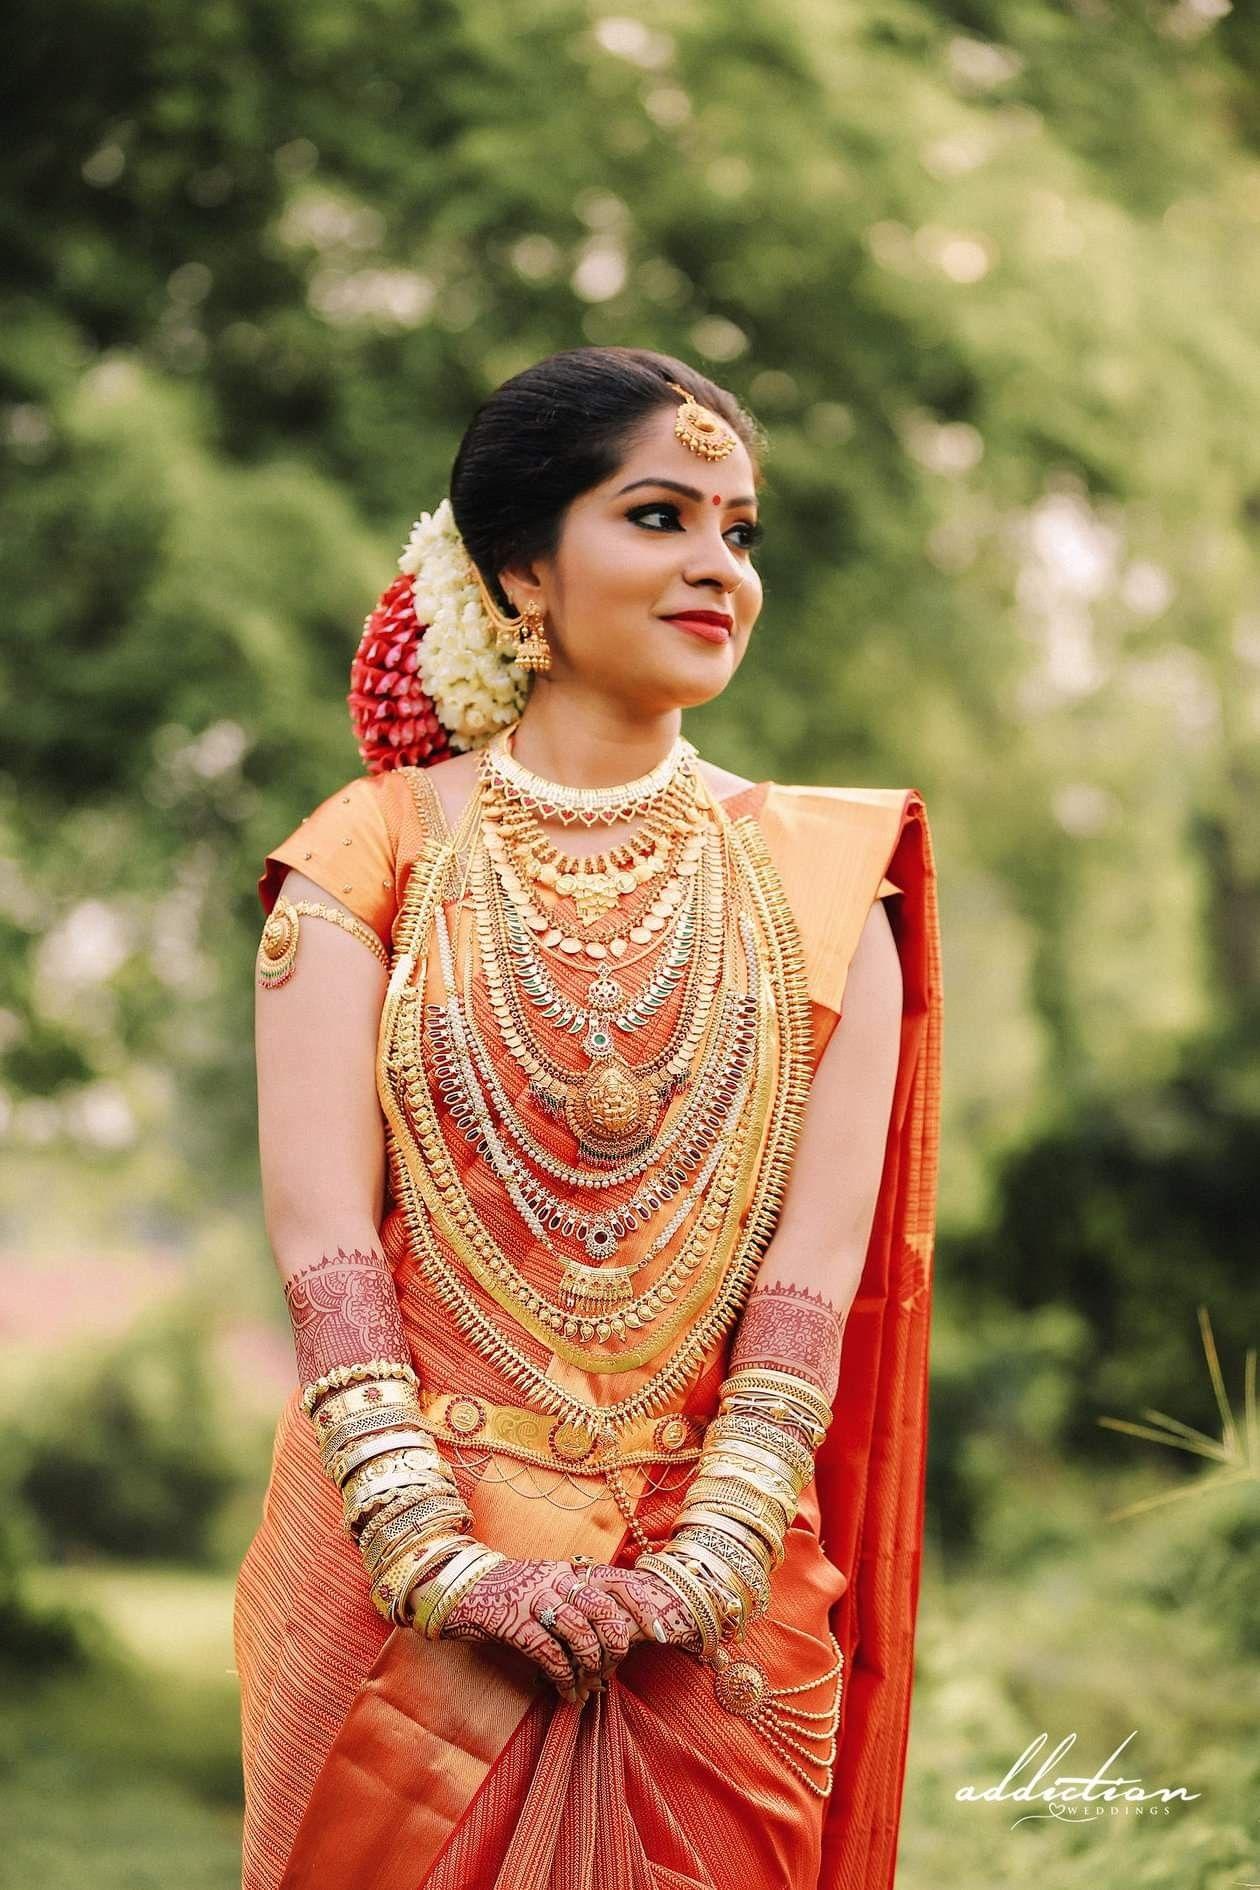 Kerala Bride Kerala Bride Hindu Bride Bride Photoshoot